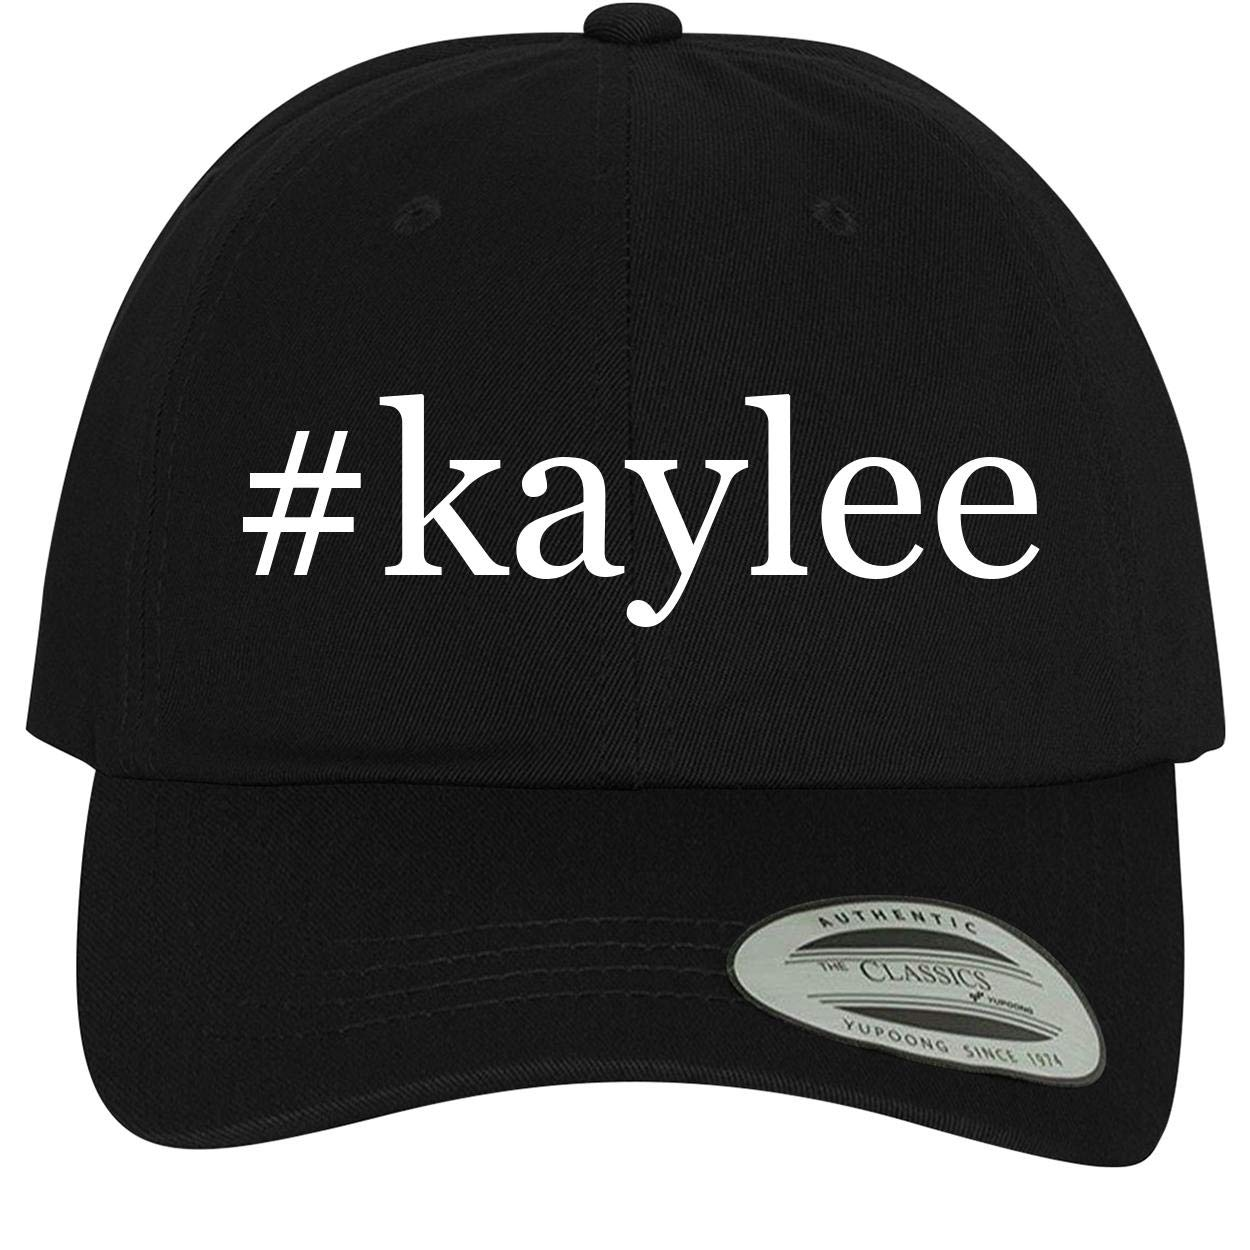 Comfortable Dad Hat Baseball Cap BH Cool Designs #Kaylee